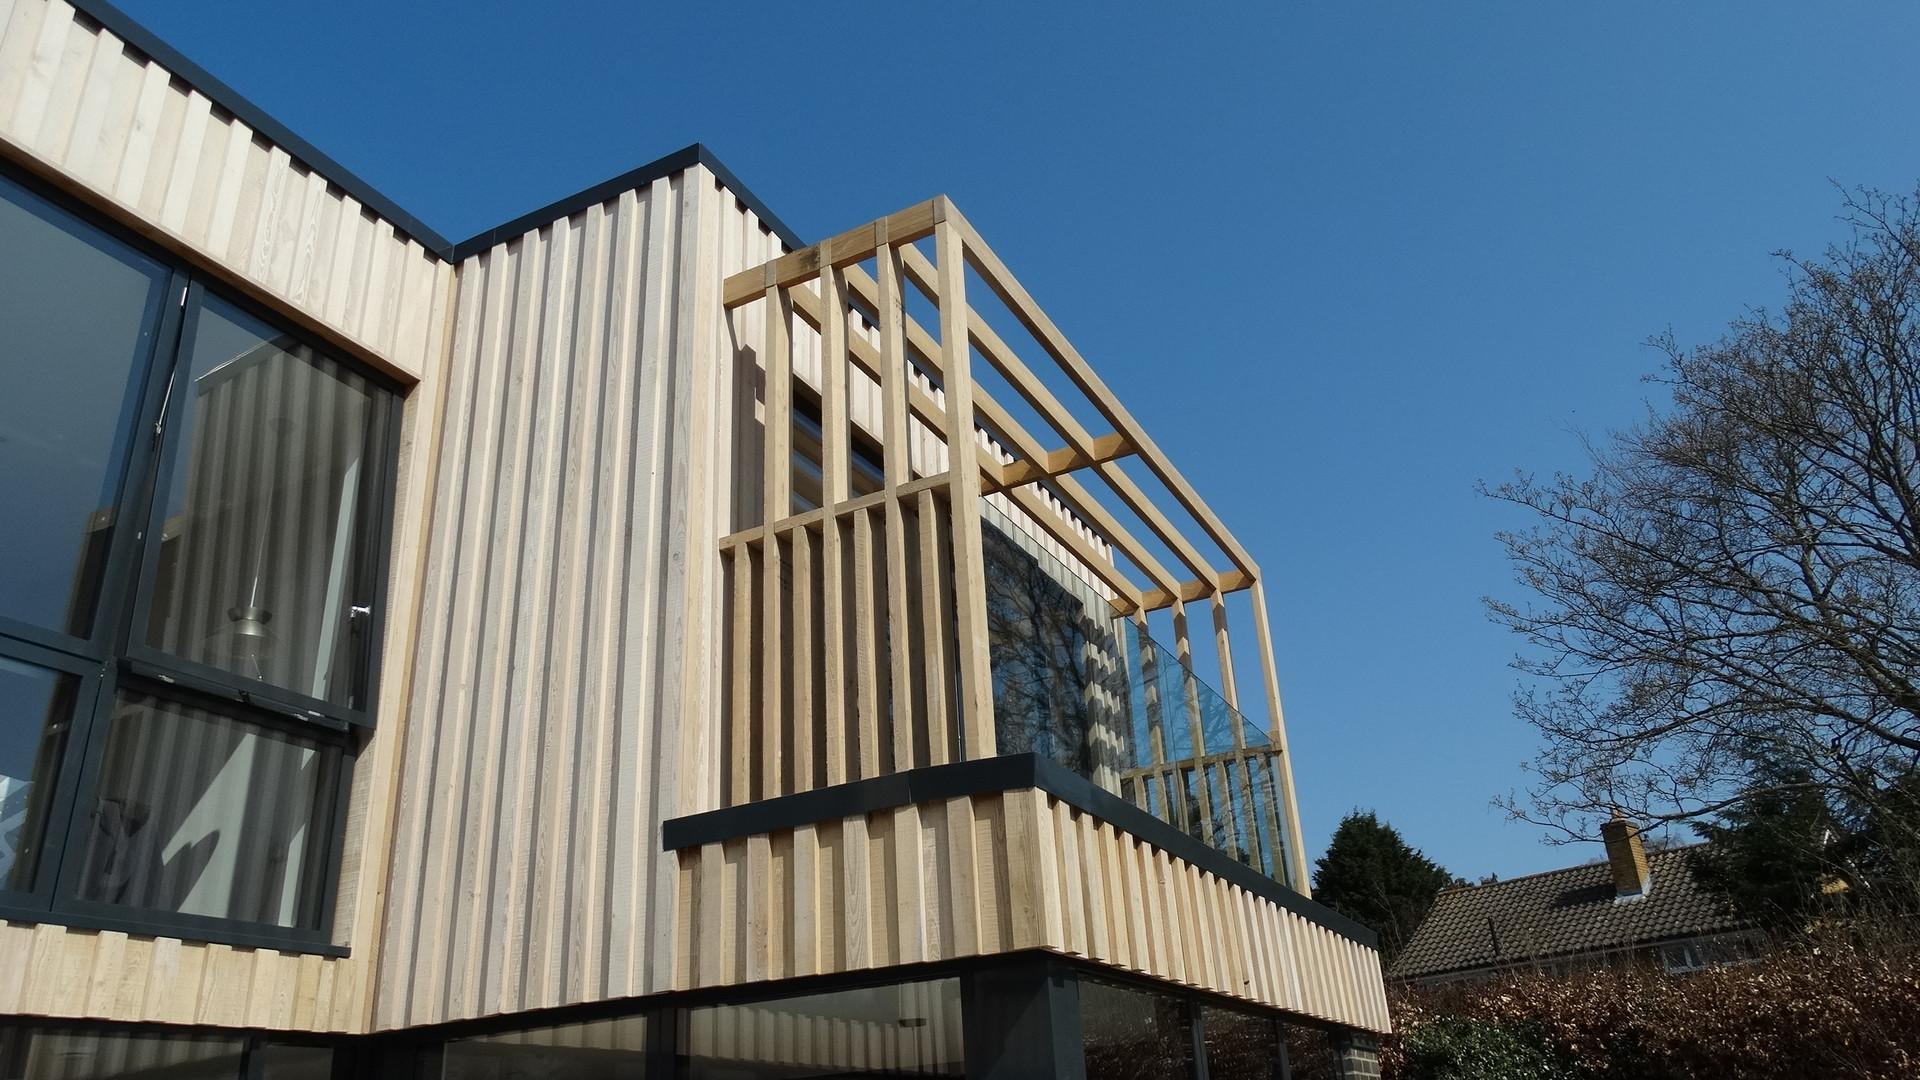 New House Build Exterior Seconf Floor - Addington